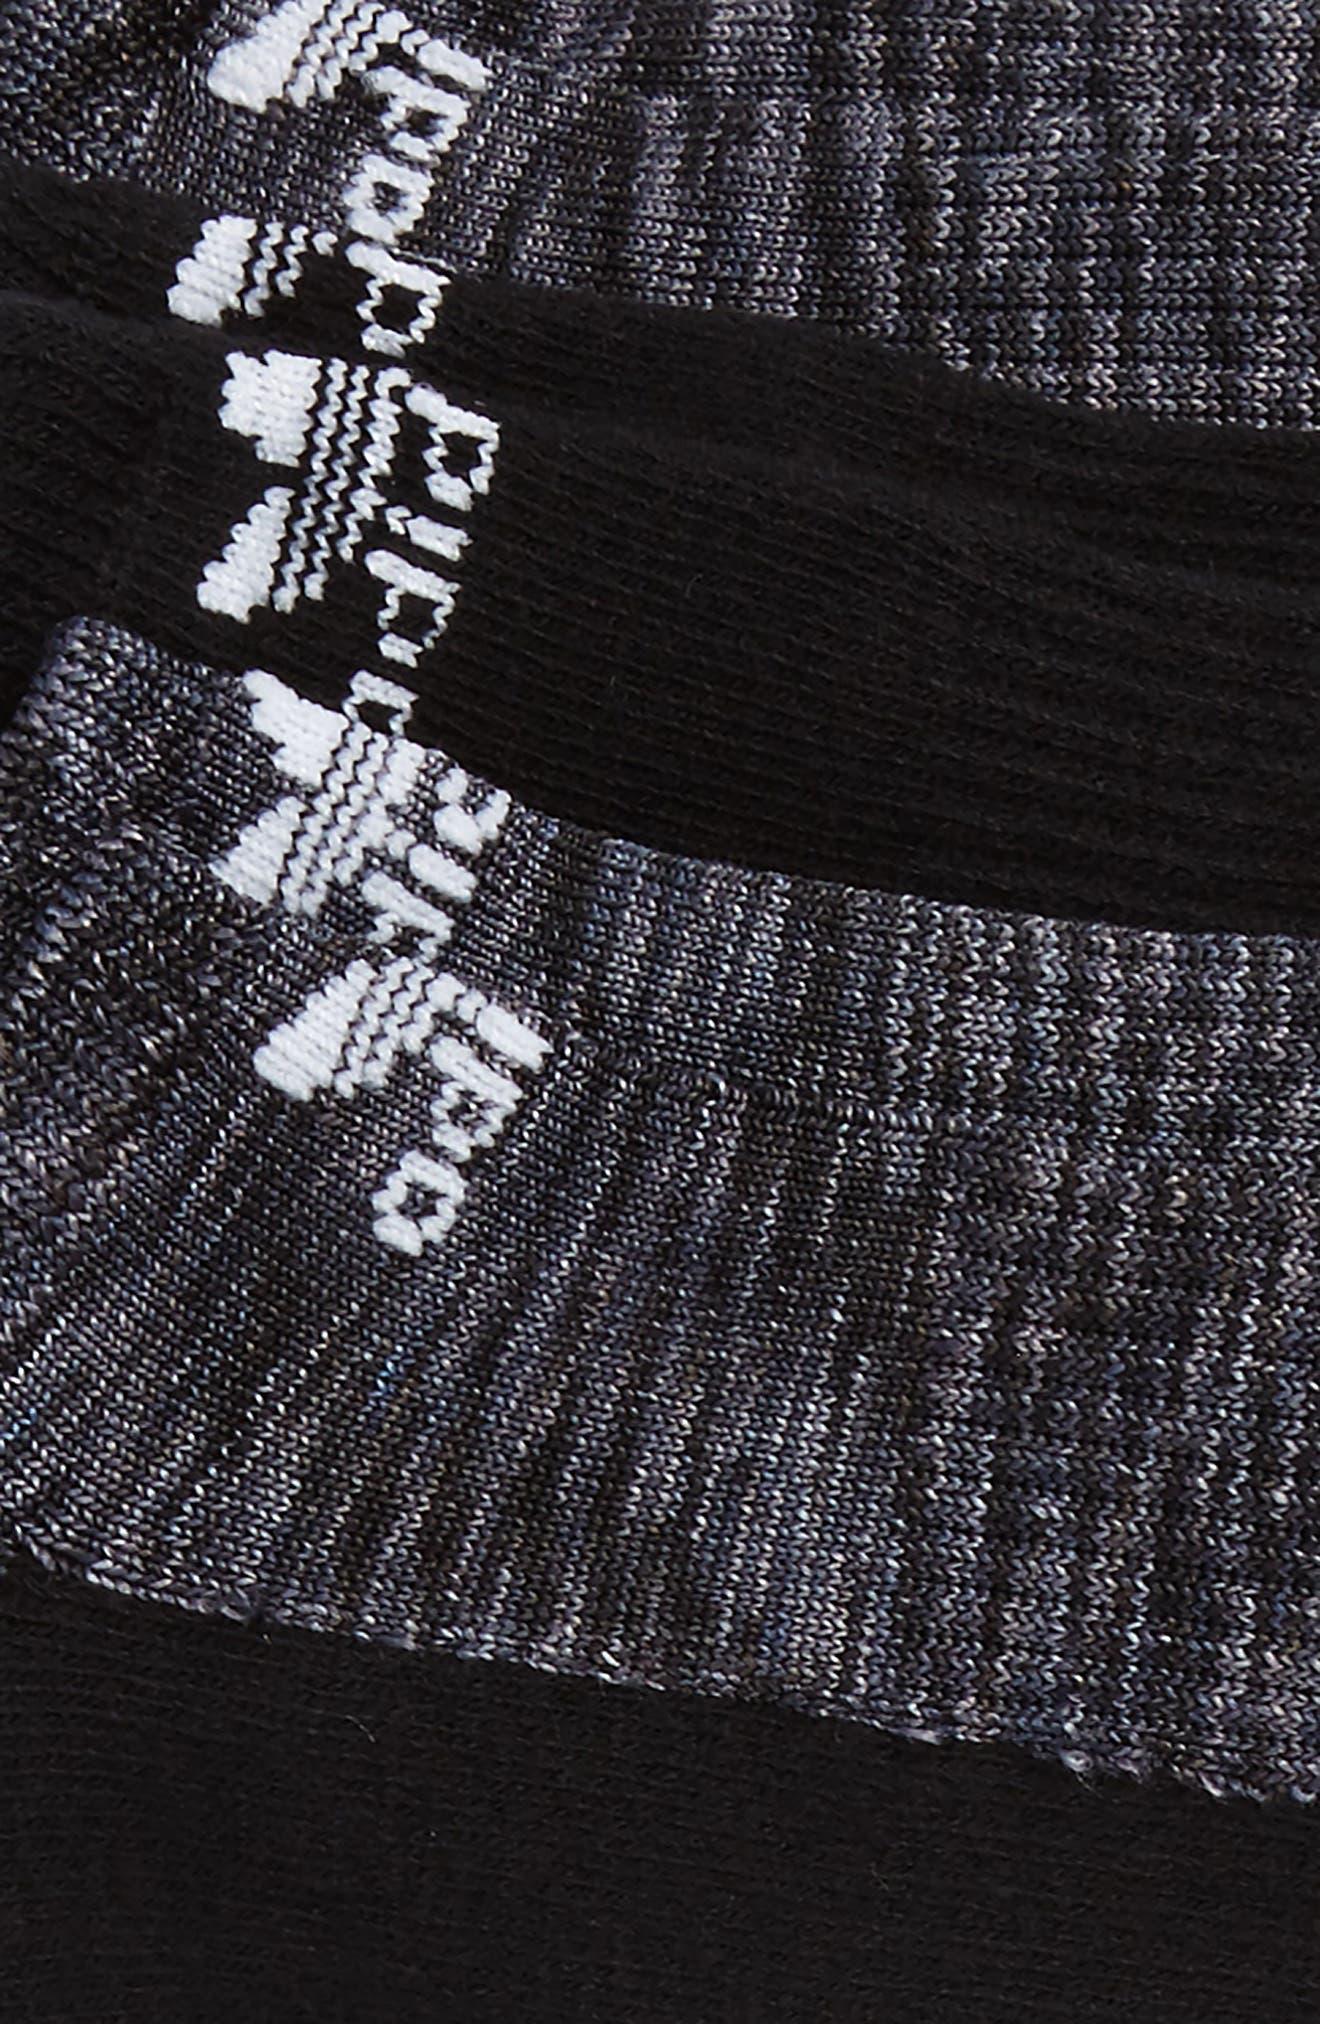 3-Pack Space Dye Low Top Socks,                             Alternate thumbnail 2, color,                             Black/ Grey/ Onyx/ White